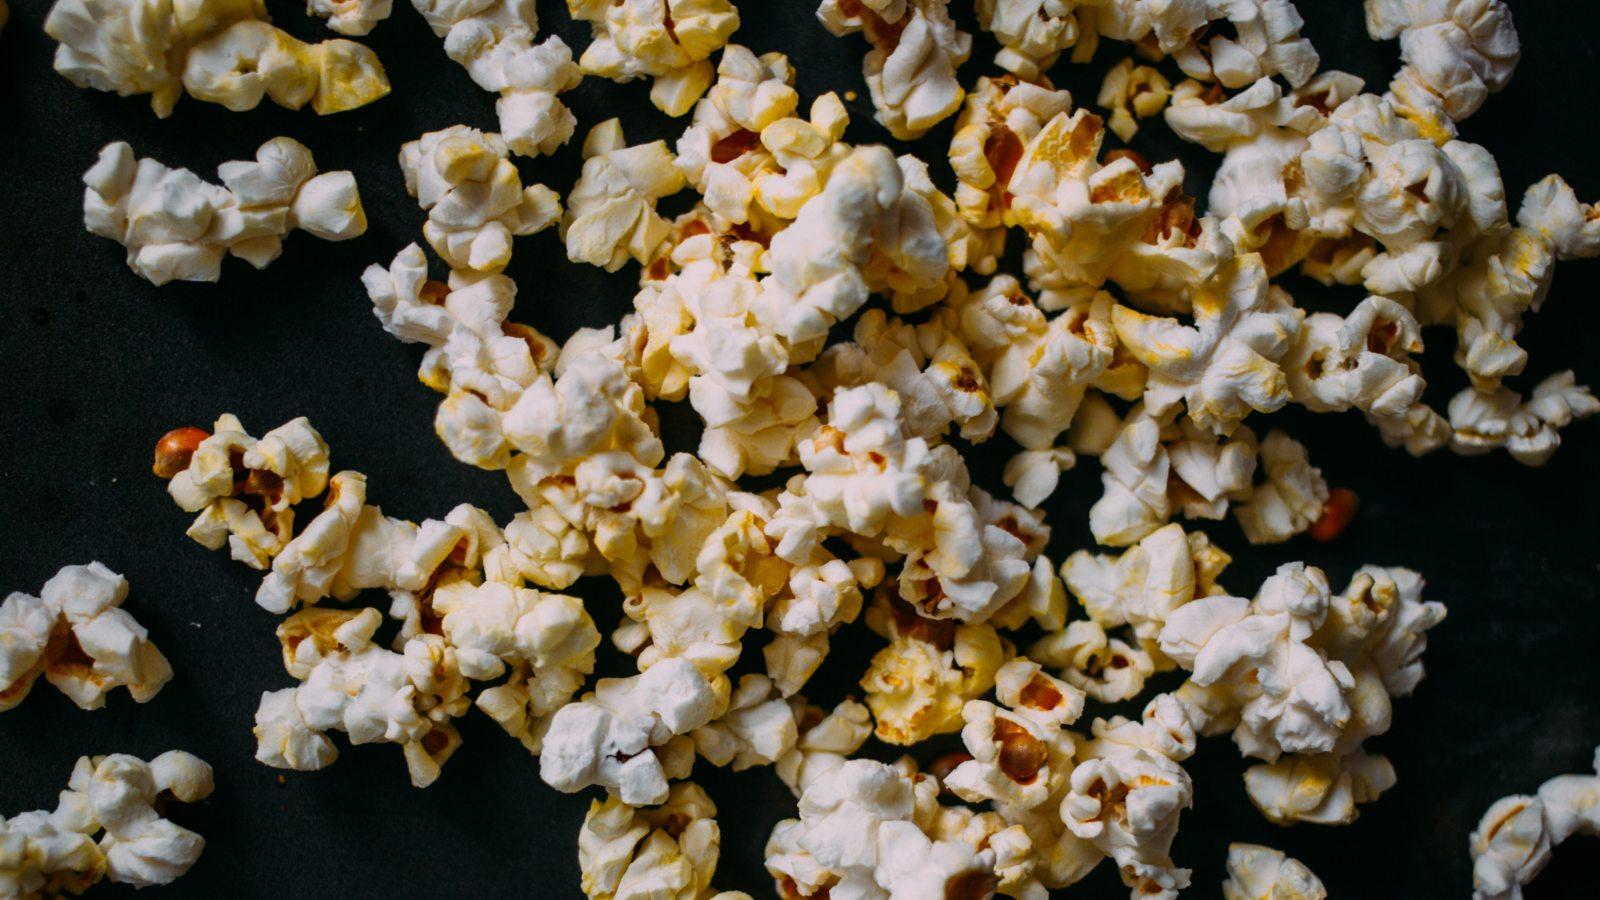 popcorn cinema snacks